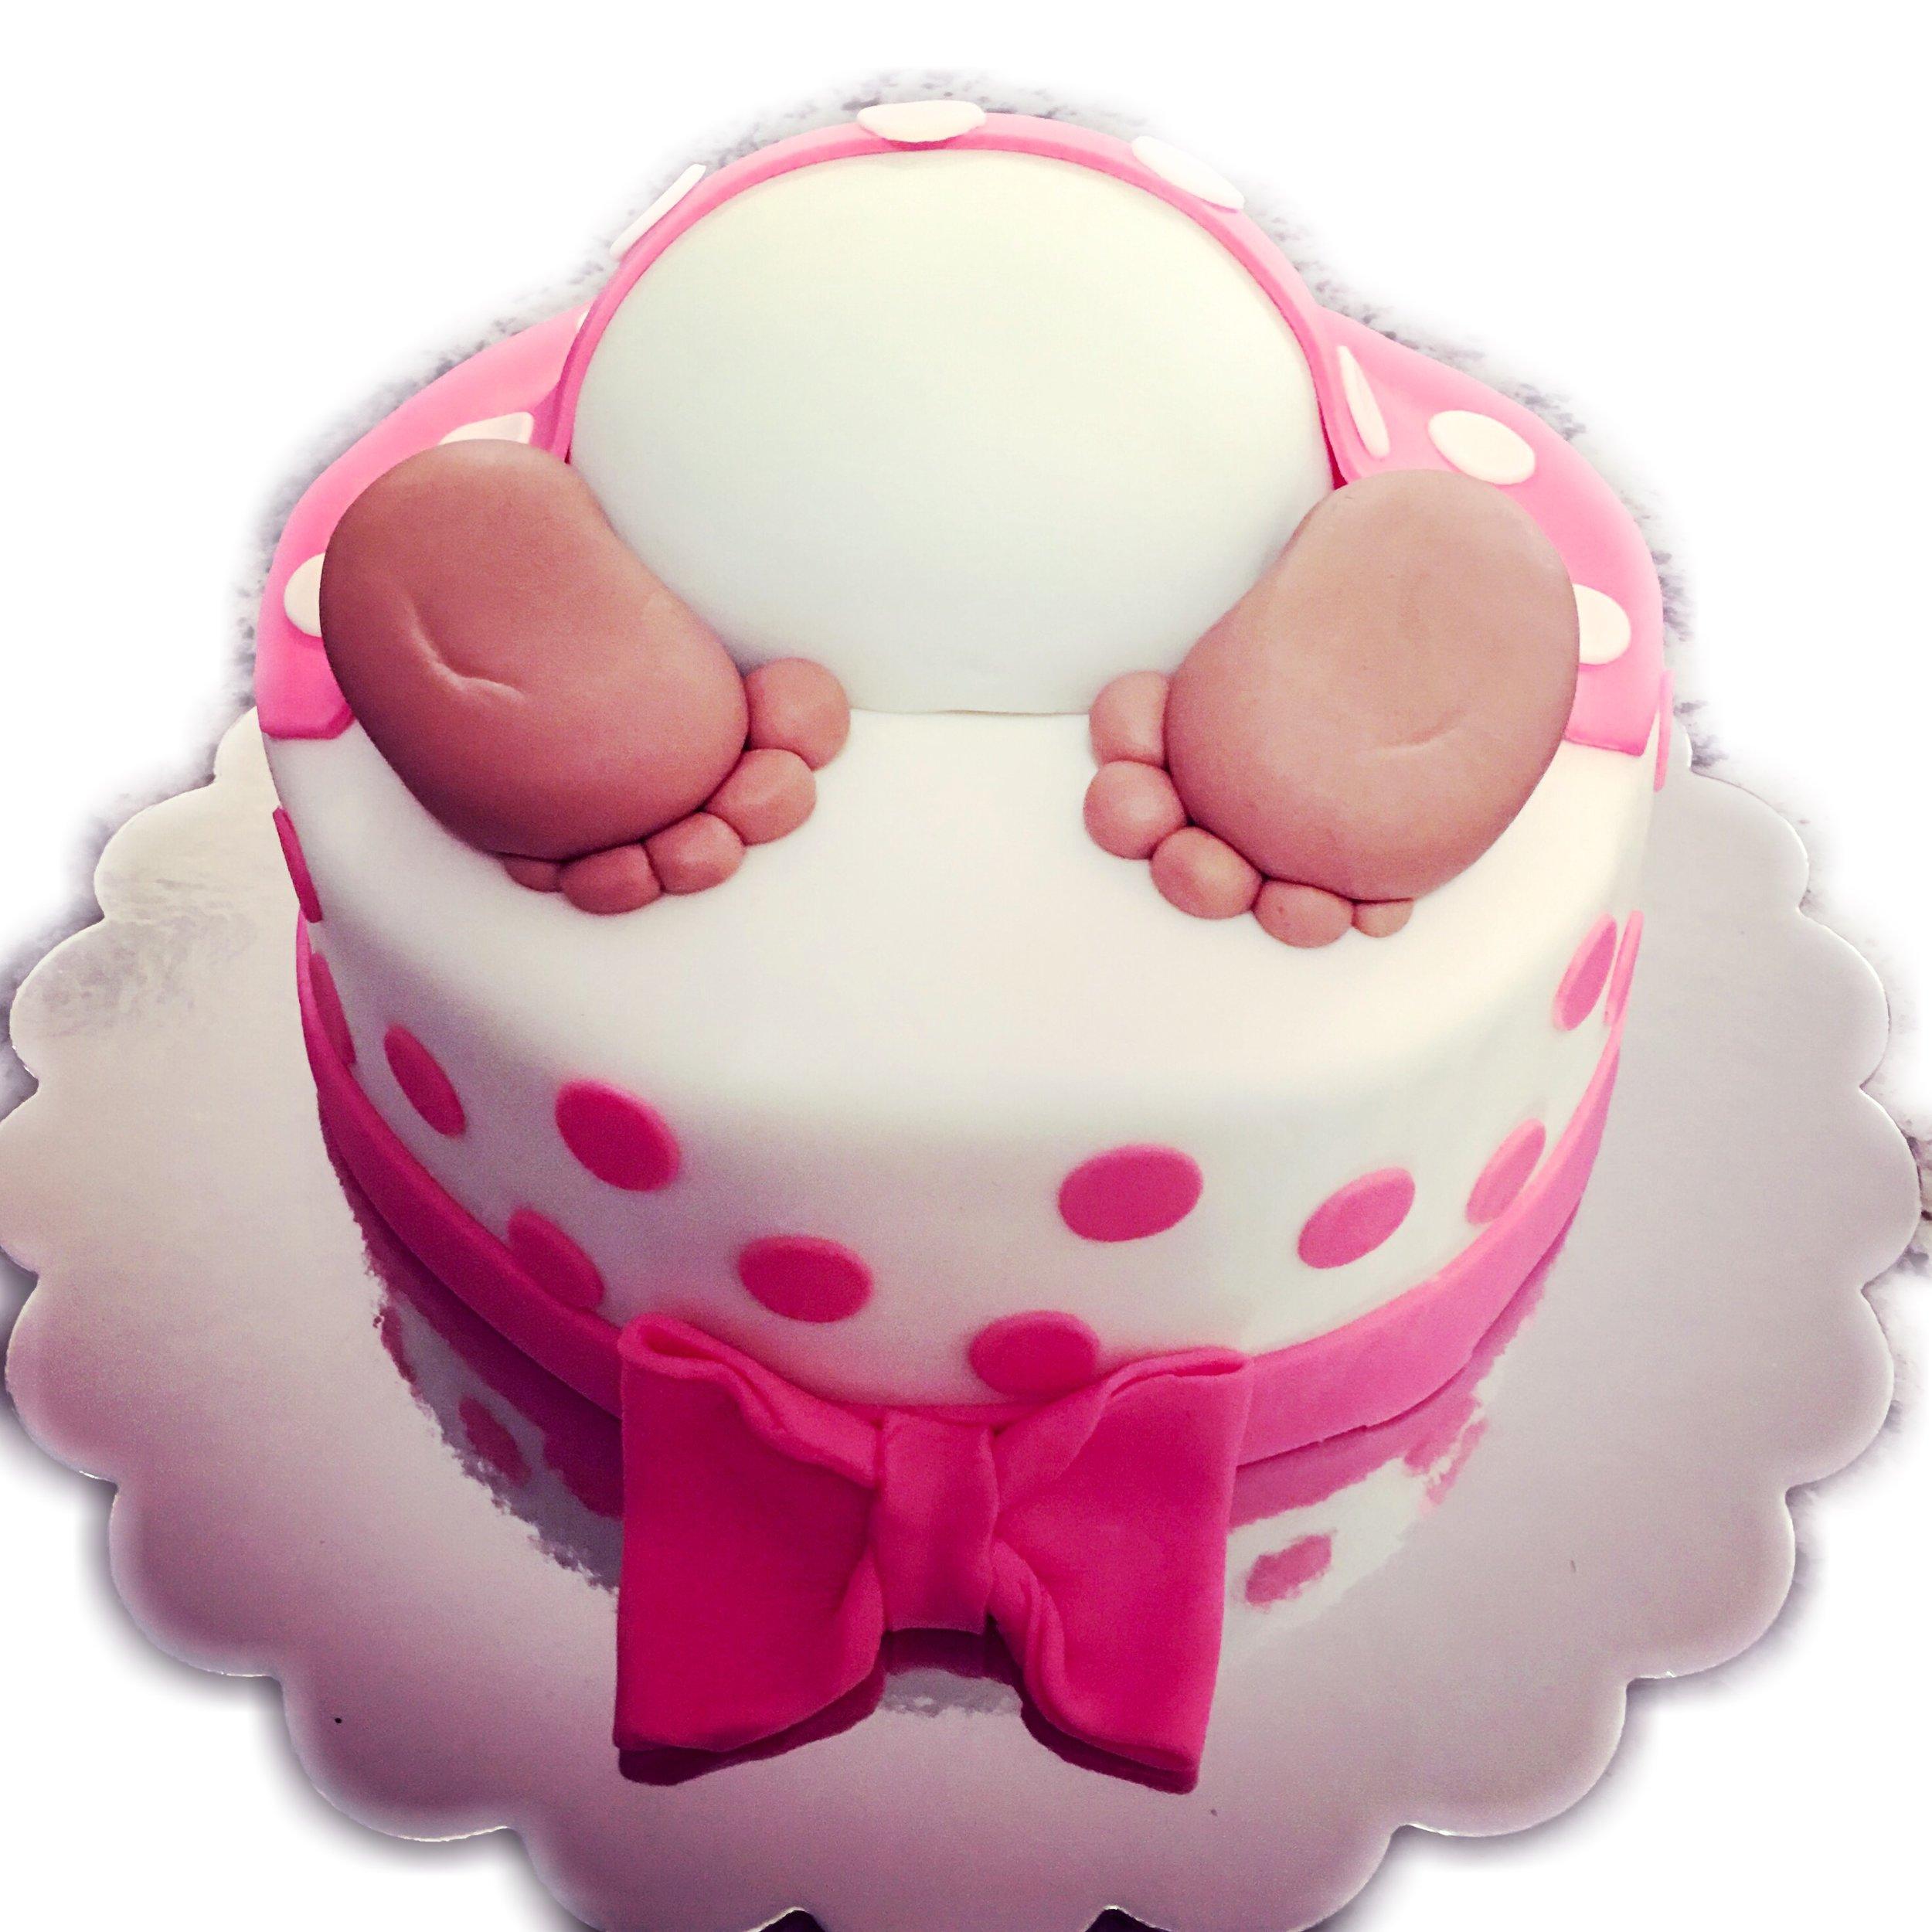 Baby Bottom Shower Cake